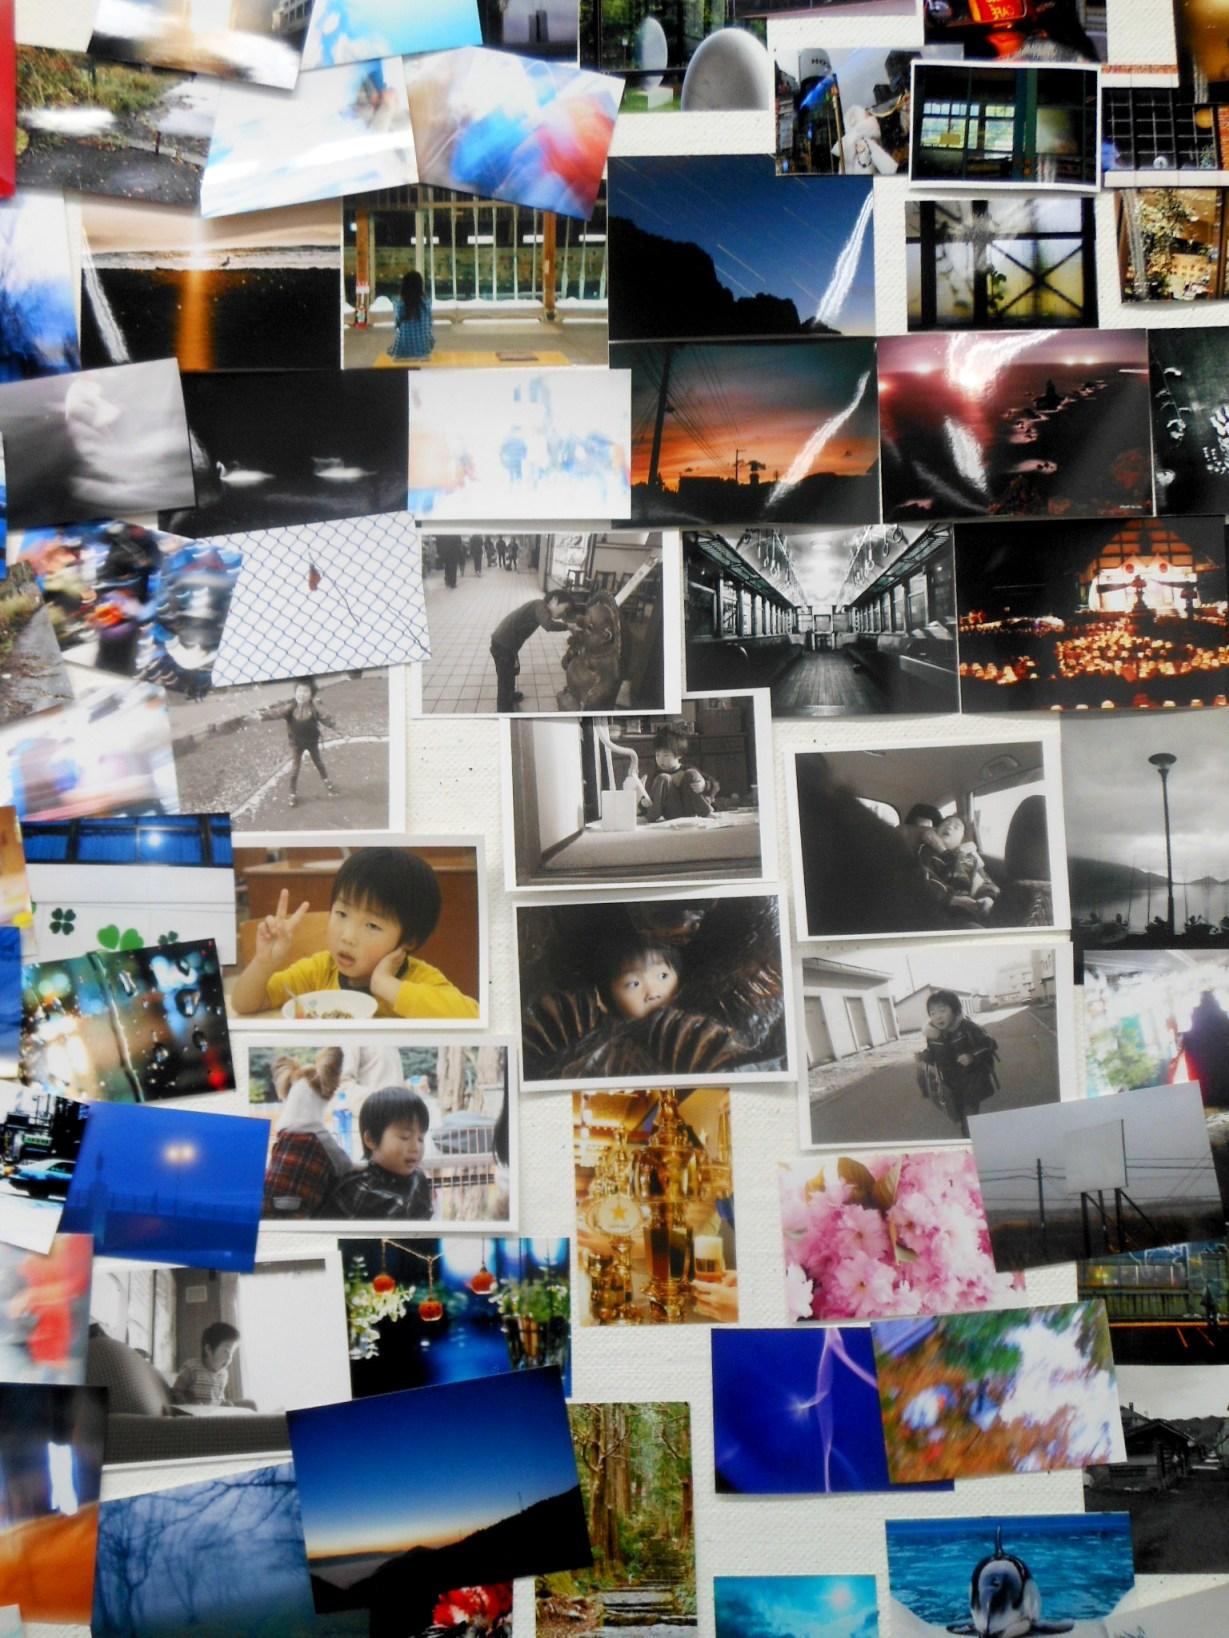 1885)②「写真クラブ「BePHaT!!」 第9回作品展 『夢 Photo 2012』」市民g. 終了11月21日(水)~11月25日(日)_f0126829_2244722.jpg